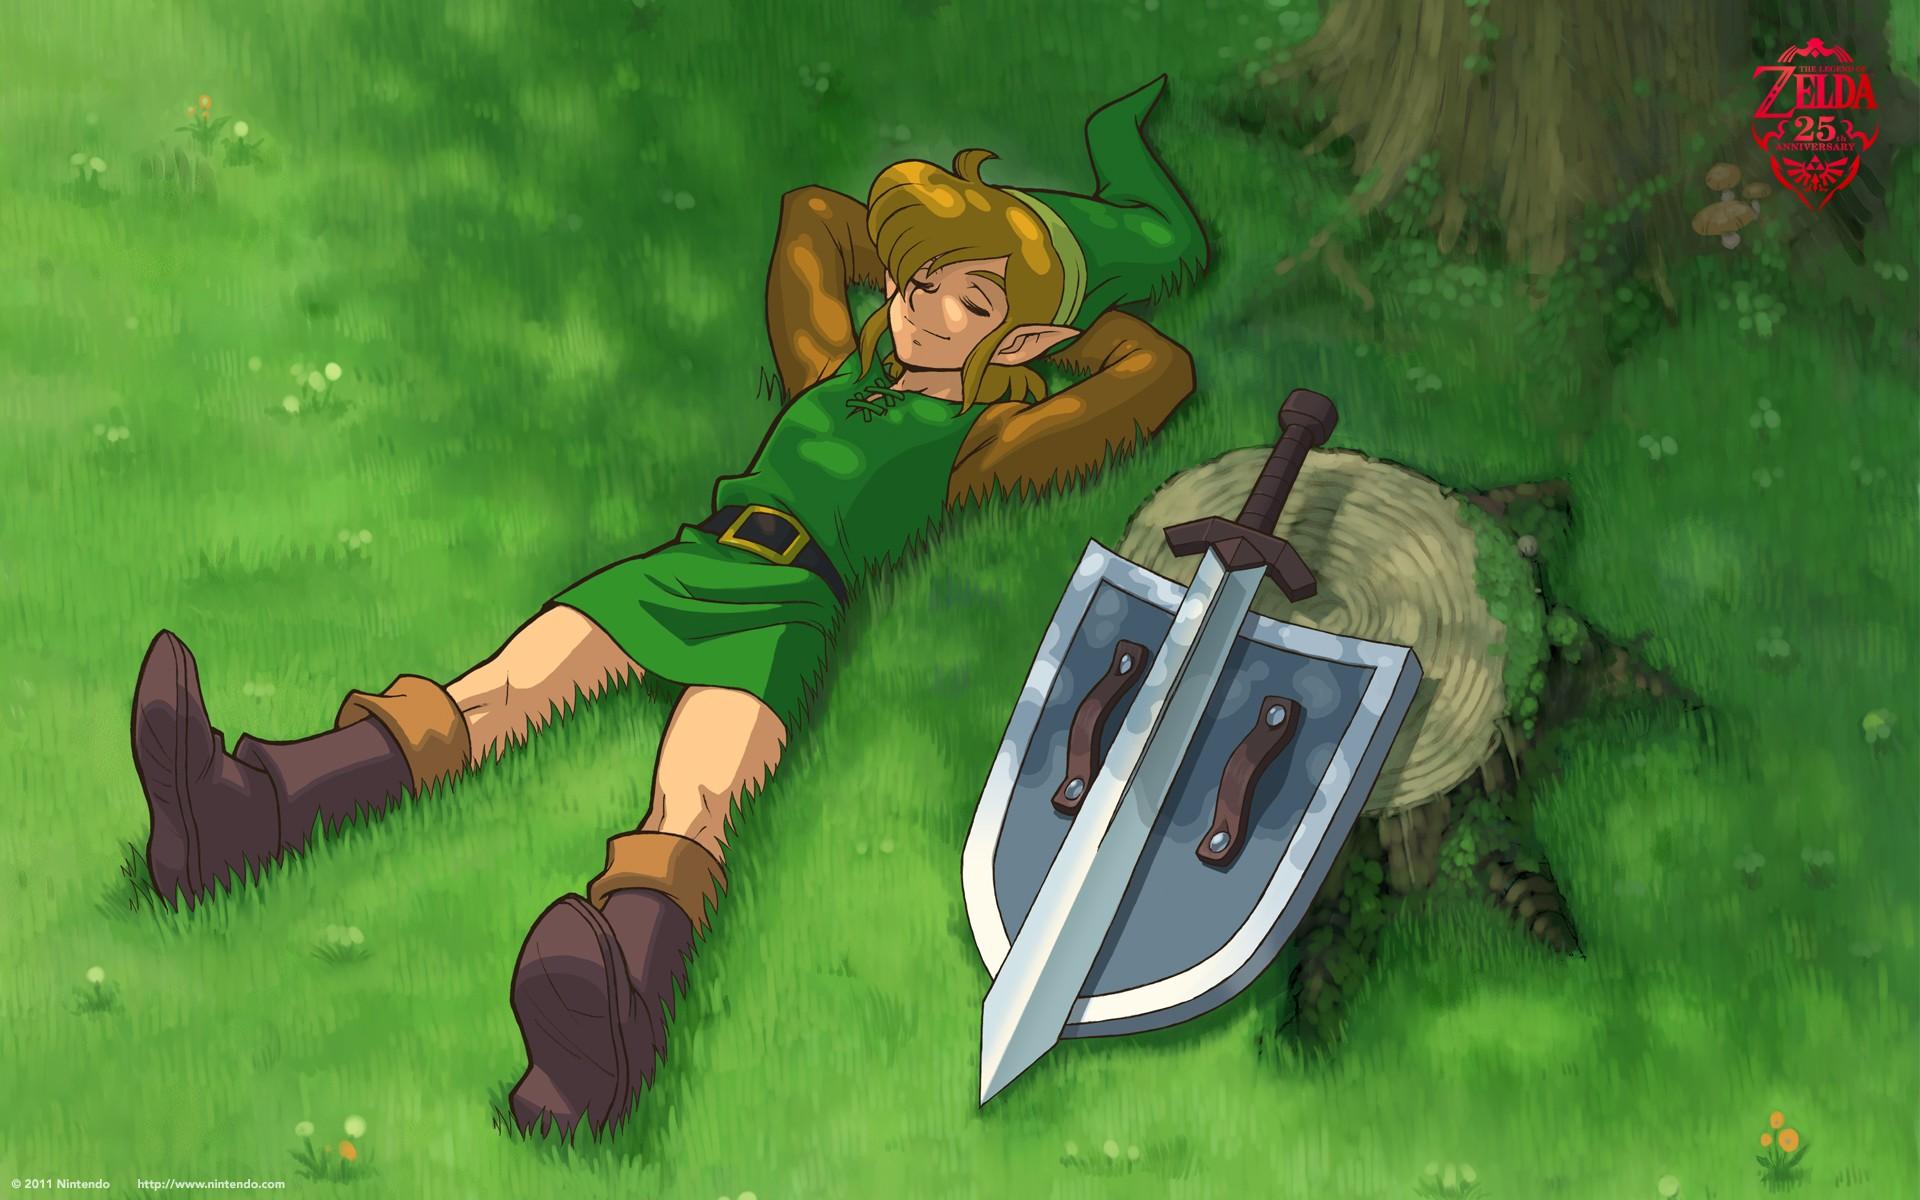 La leyenda de Zelda - 1920x1200